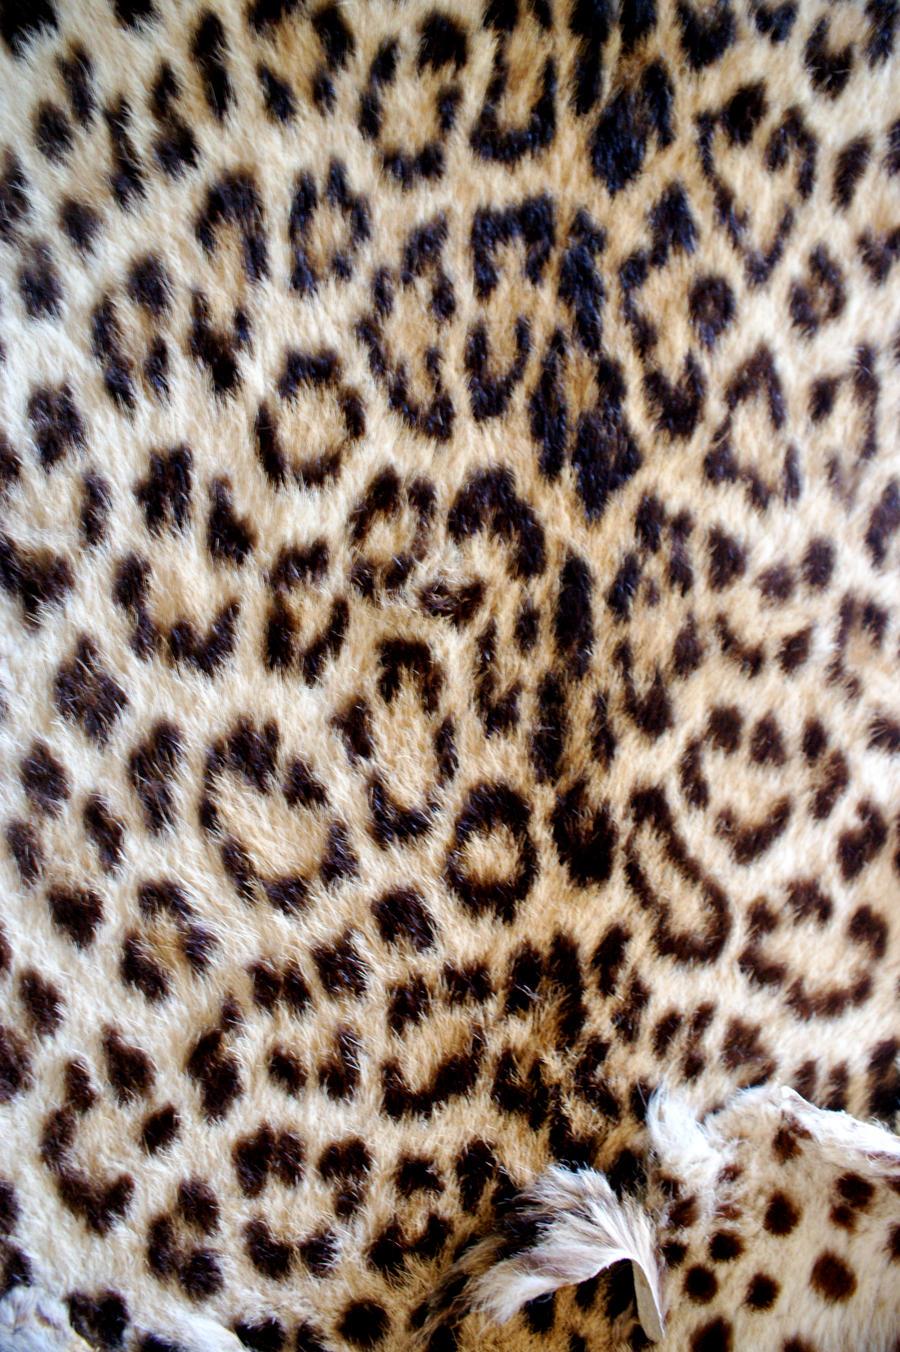 Detail of leopard fur. by LubelleCreativeSpark